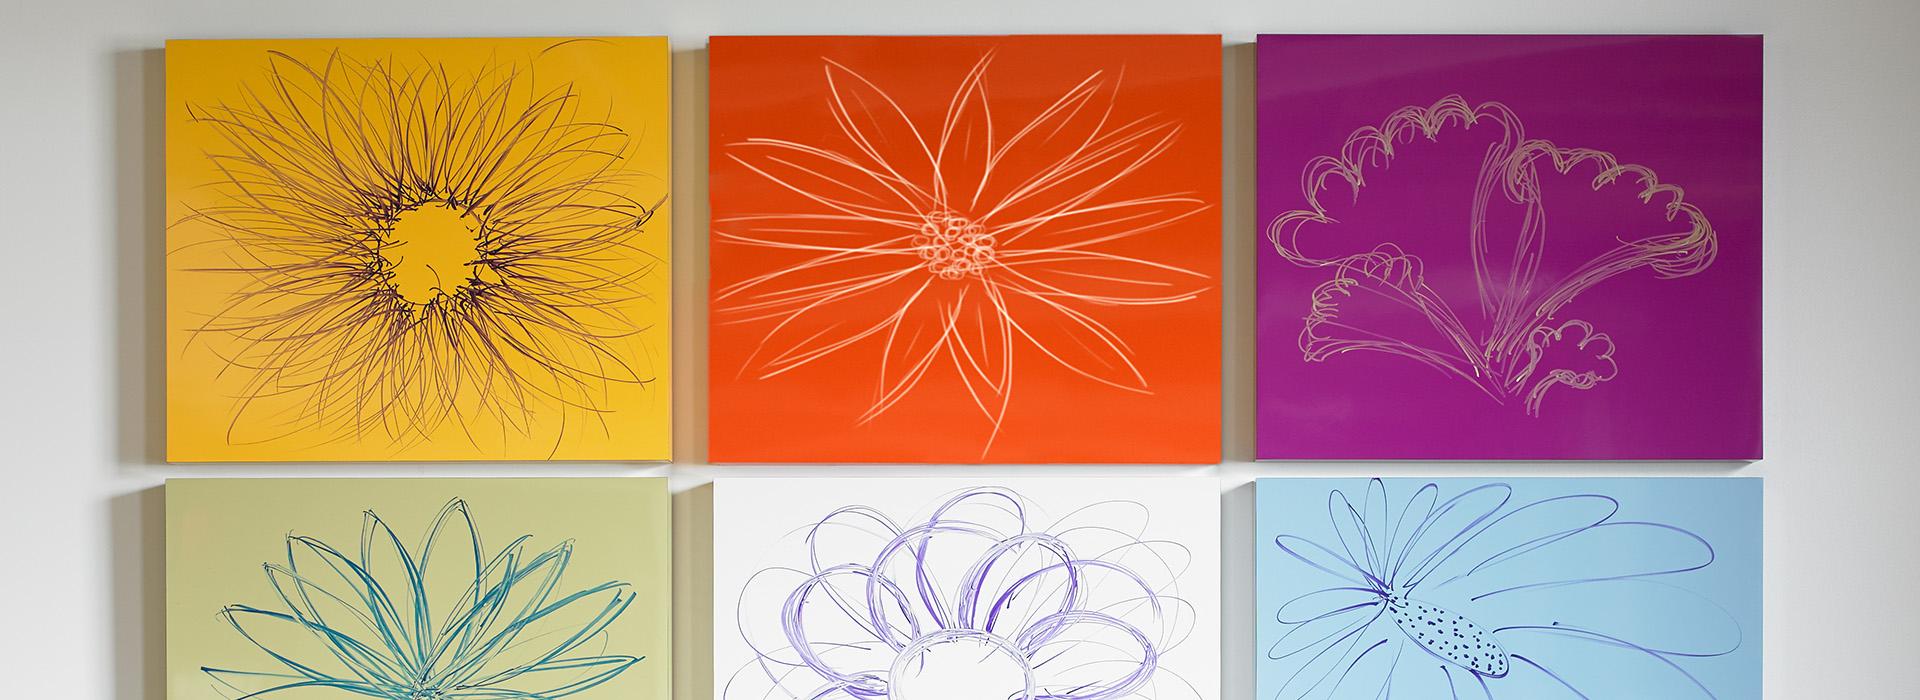 Flower artwork 851 Spectrum Blue 3209 Sol 6907 Amarena 8821 Just Blue Specialty Markerboard